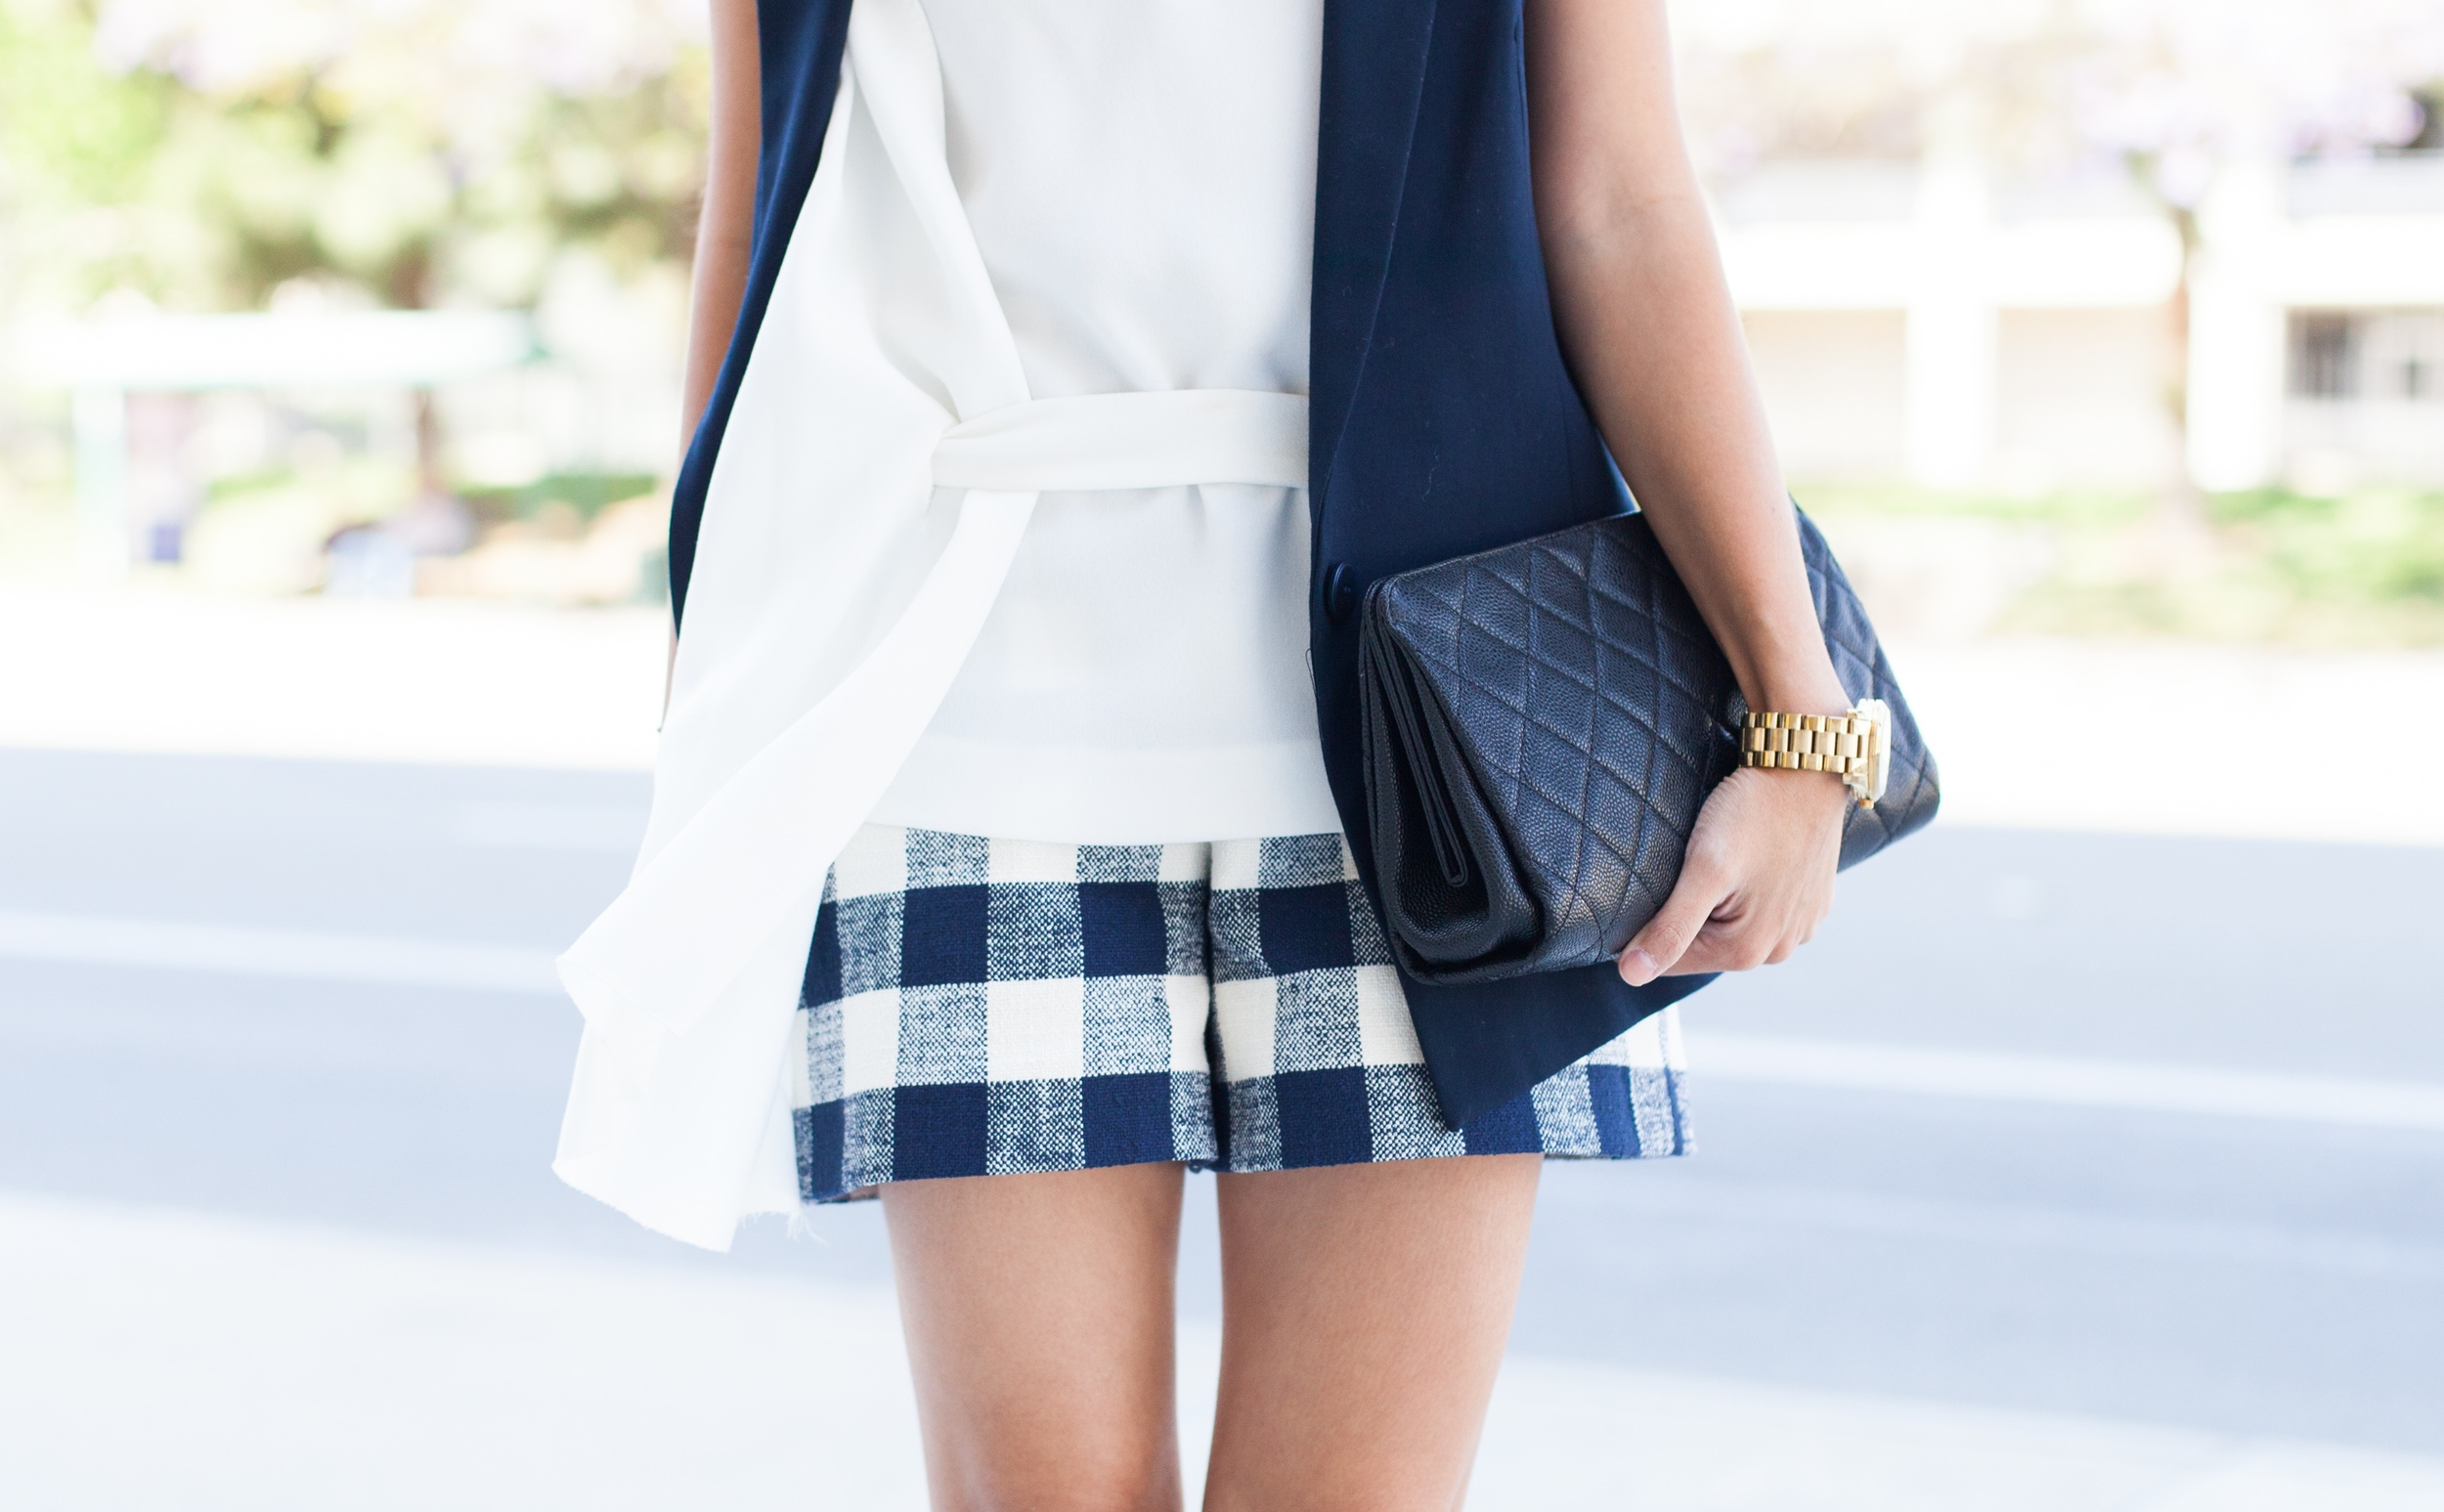 Checker Shorts (7 of 10)